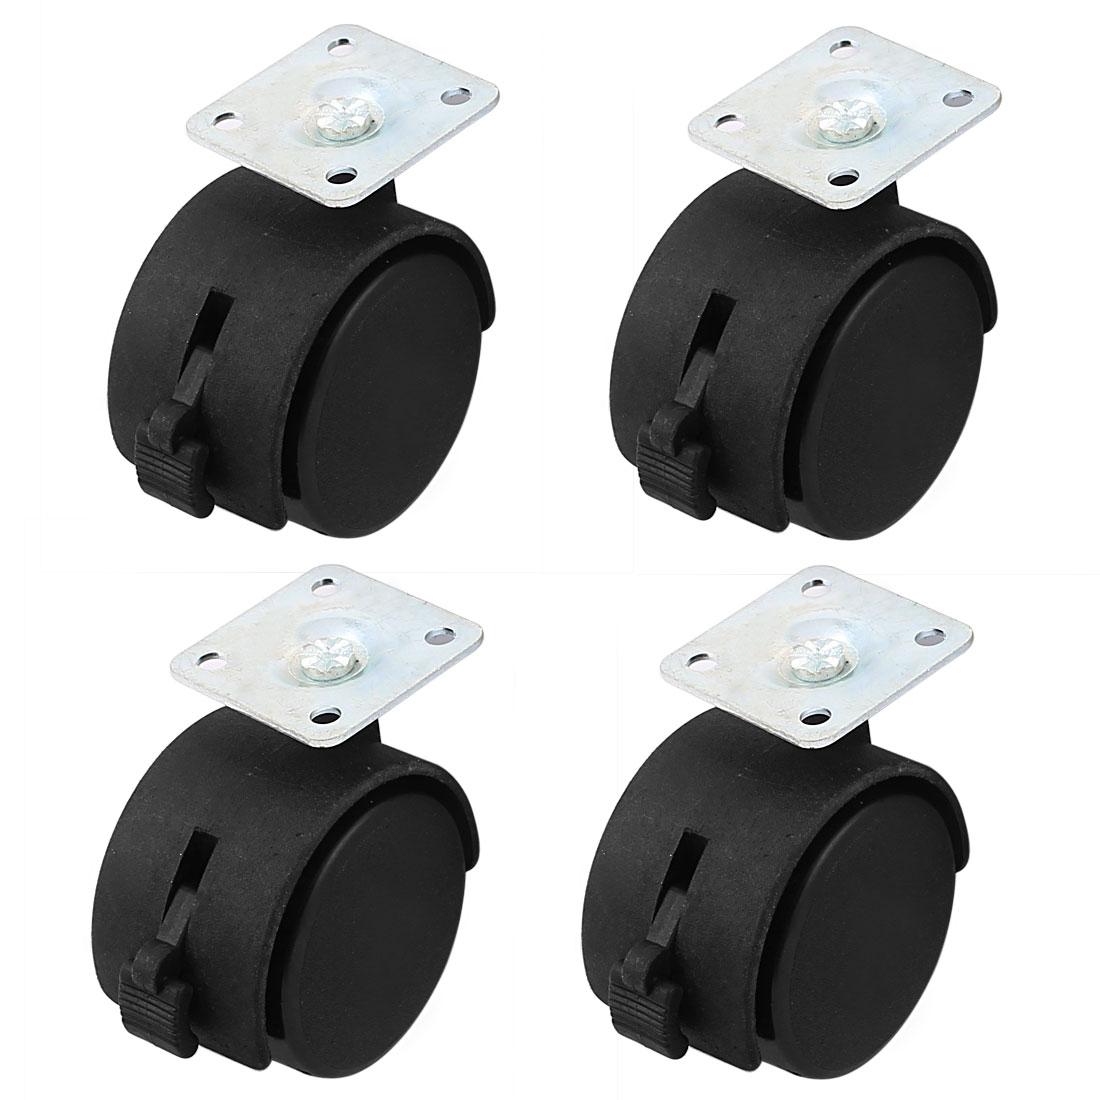 Furniture Double Nylon Wheel Plate Mount Swivel Caster Black Silver Tone 4pcs